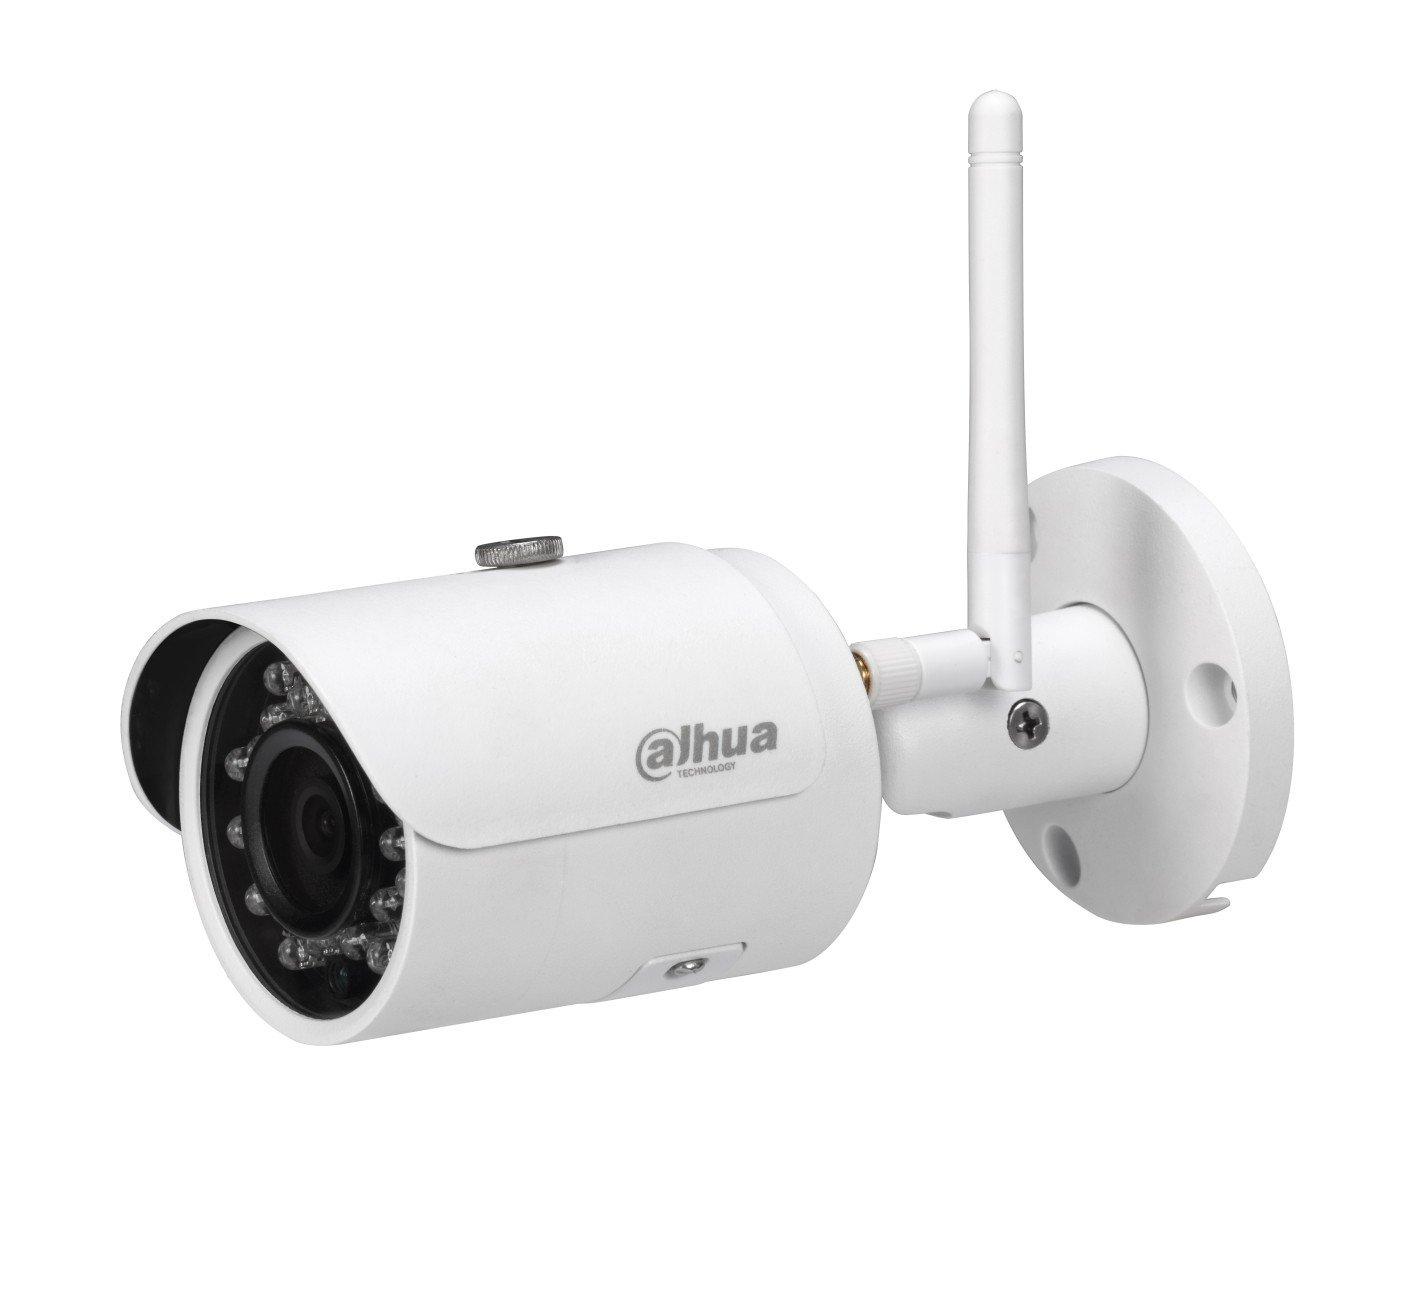 Ipcam Shop Dahua Easy4ip Ipc Hfw1435s W 4 Mp Hd Wifi